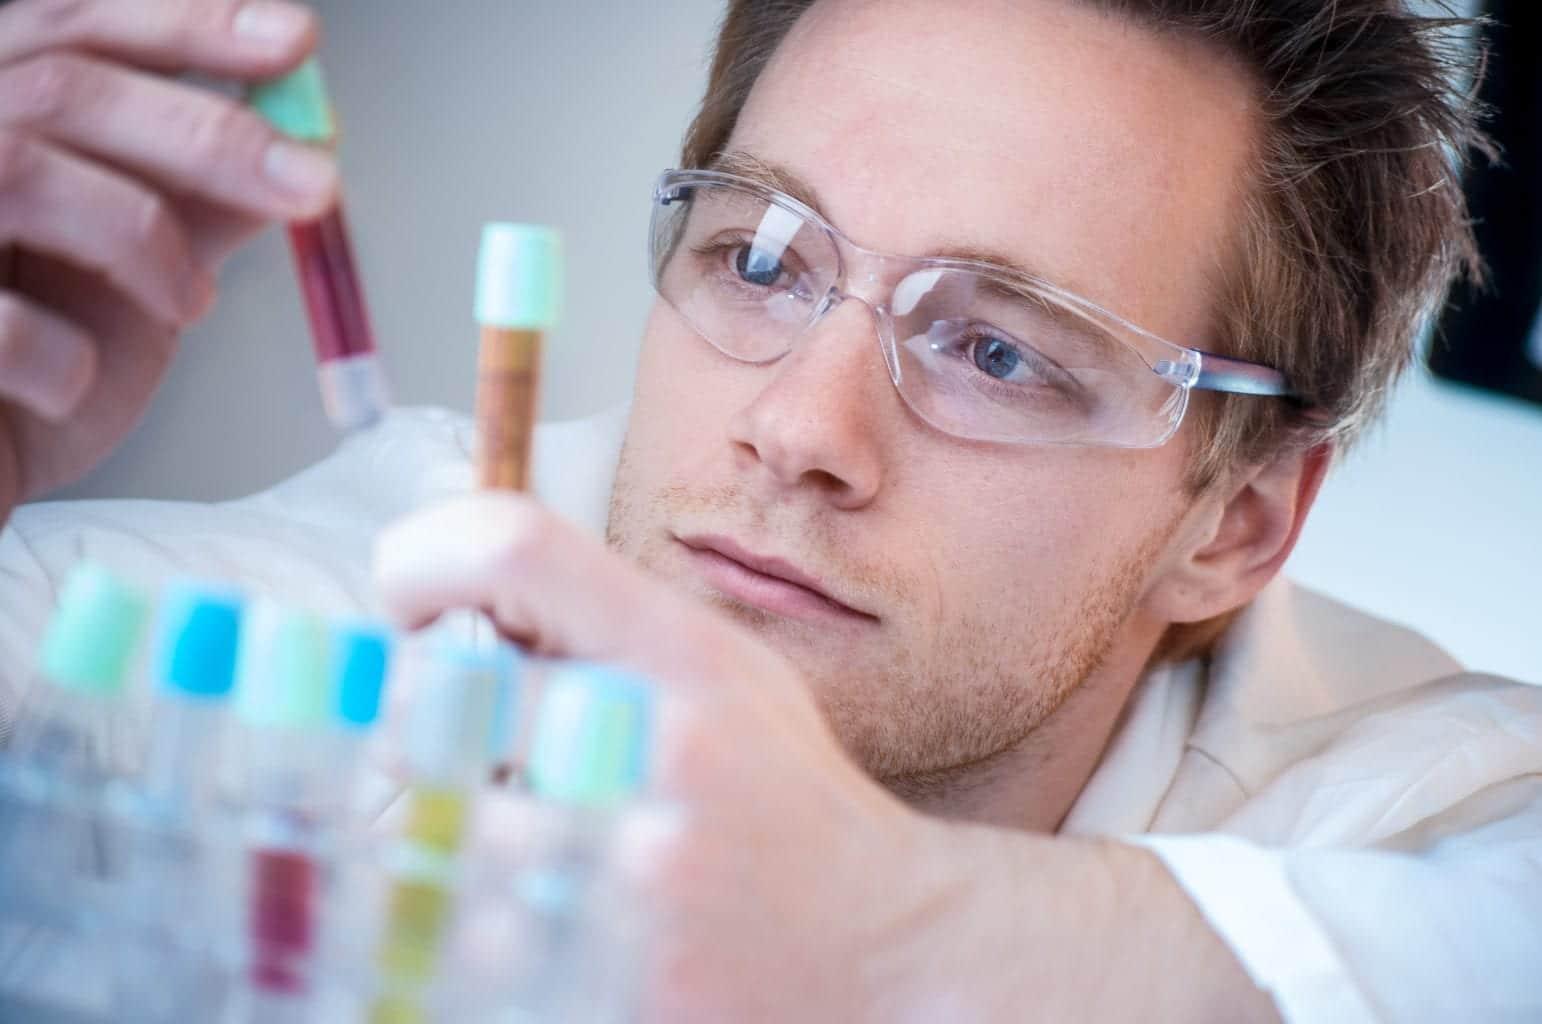 Scientist Comparing Results in his laboratory